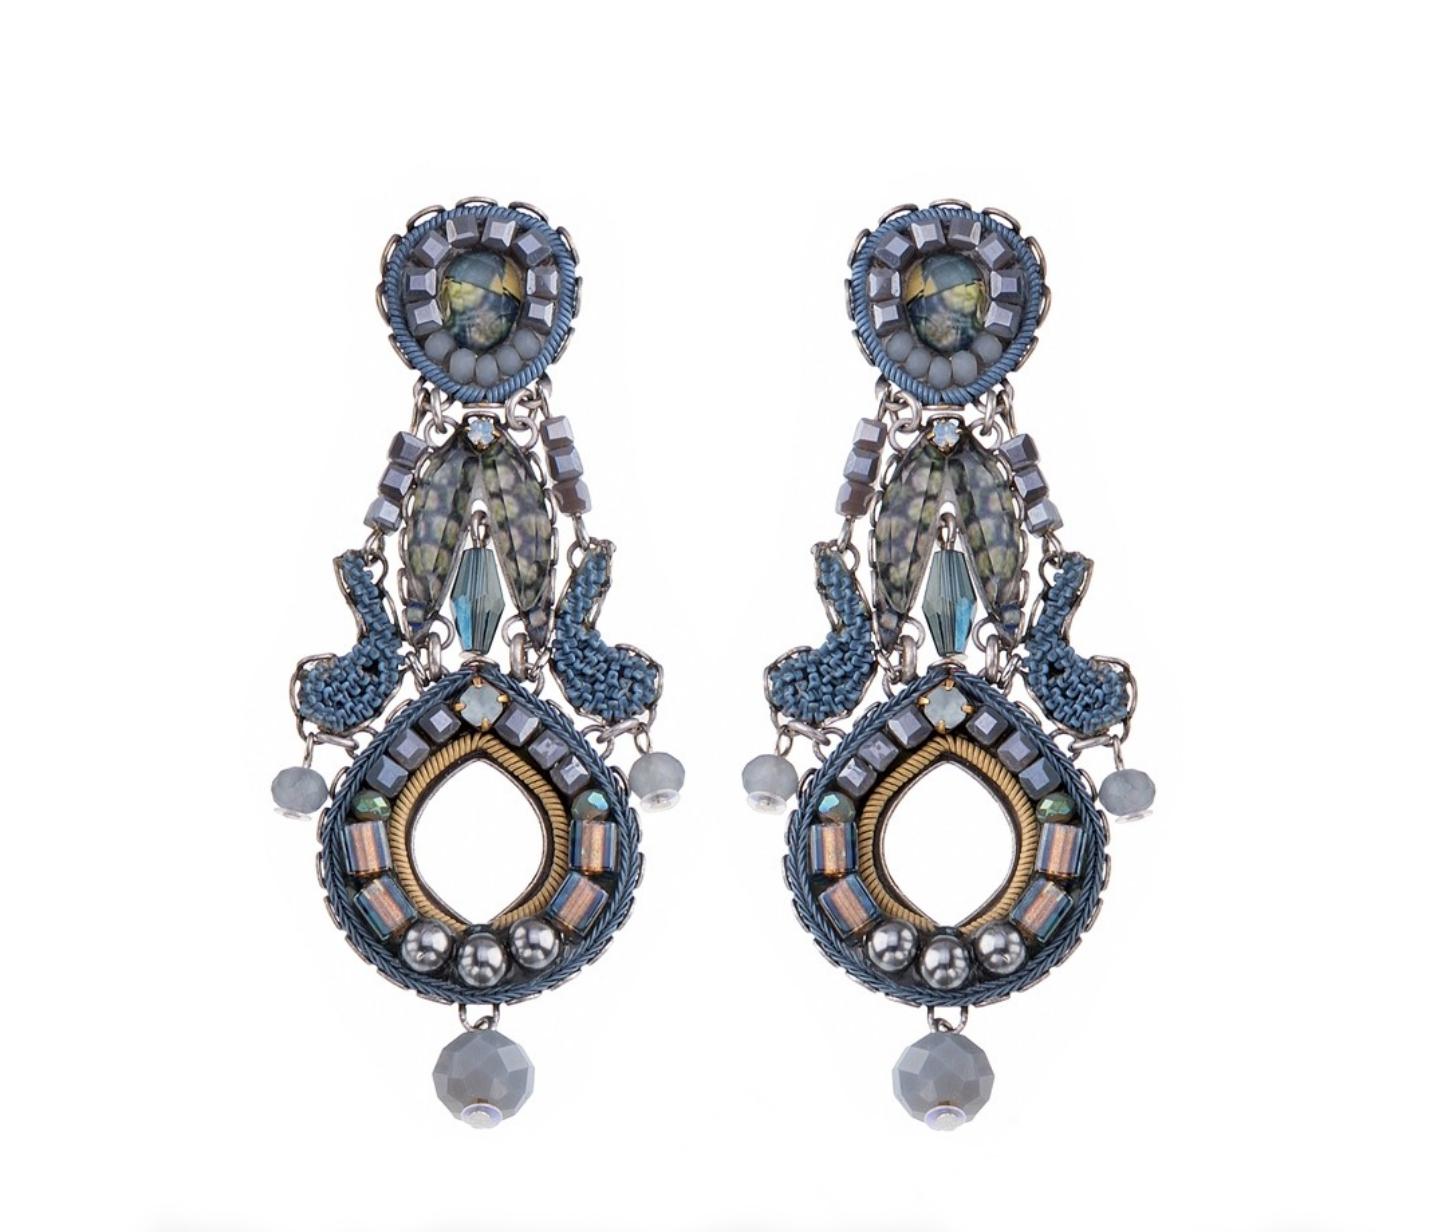 Magic Potion - Hestia Earrings